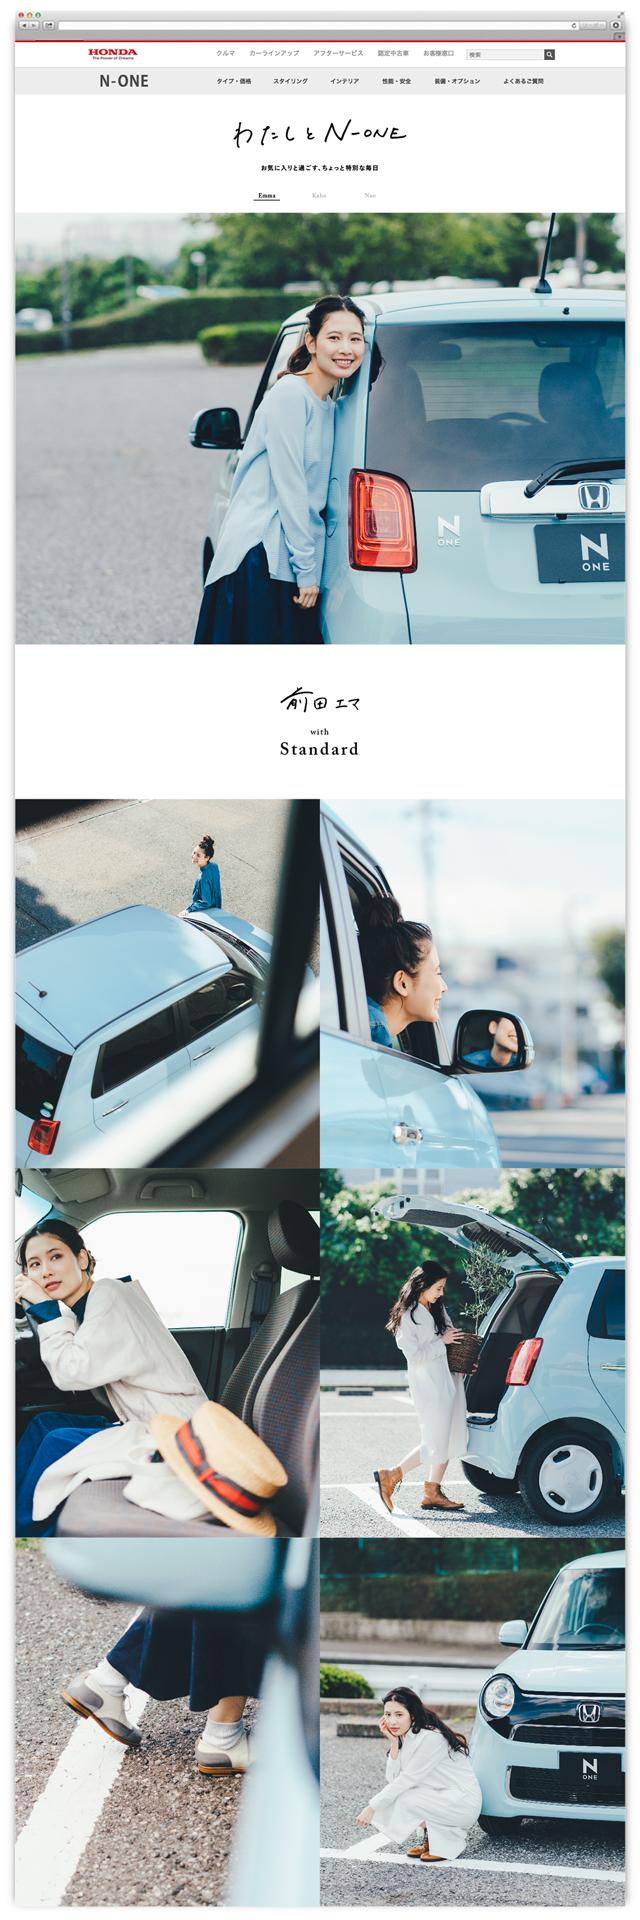 Honda_NONE_003